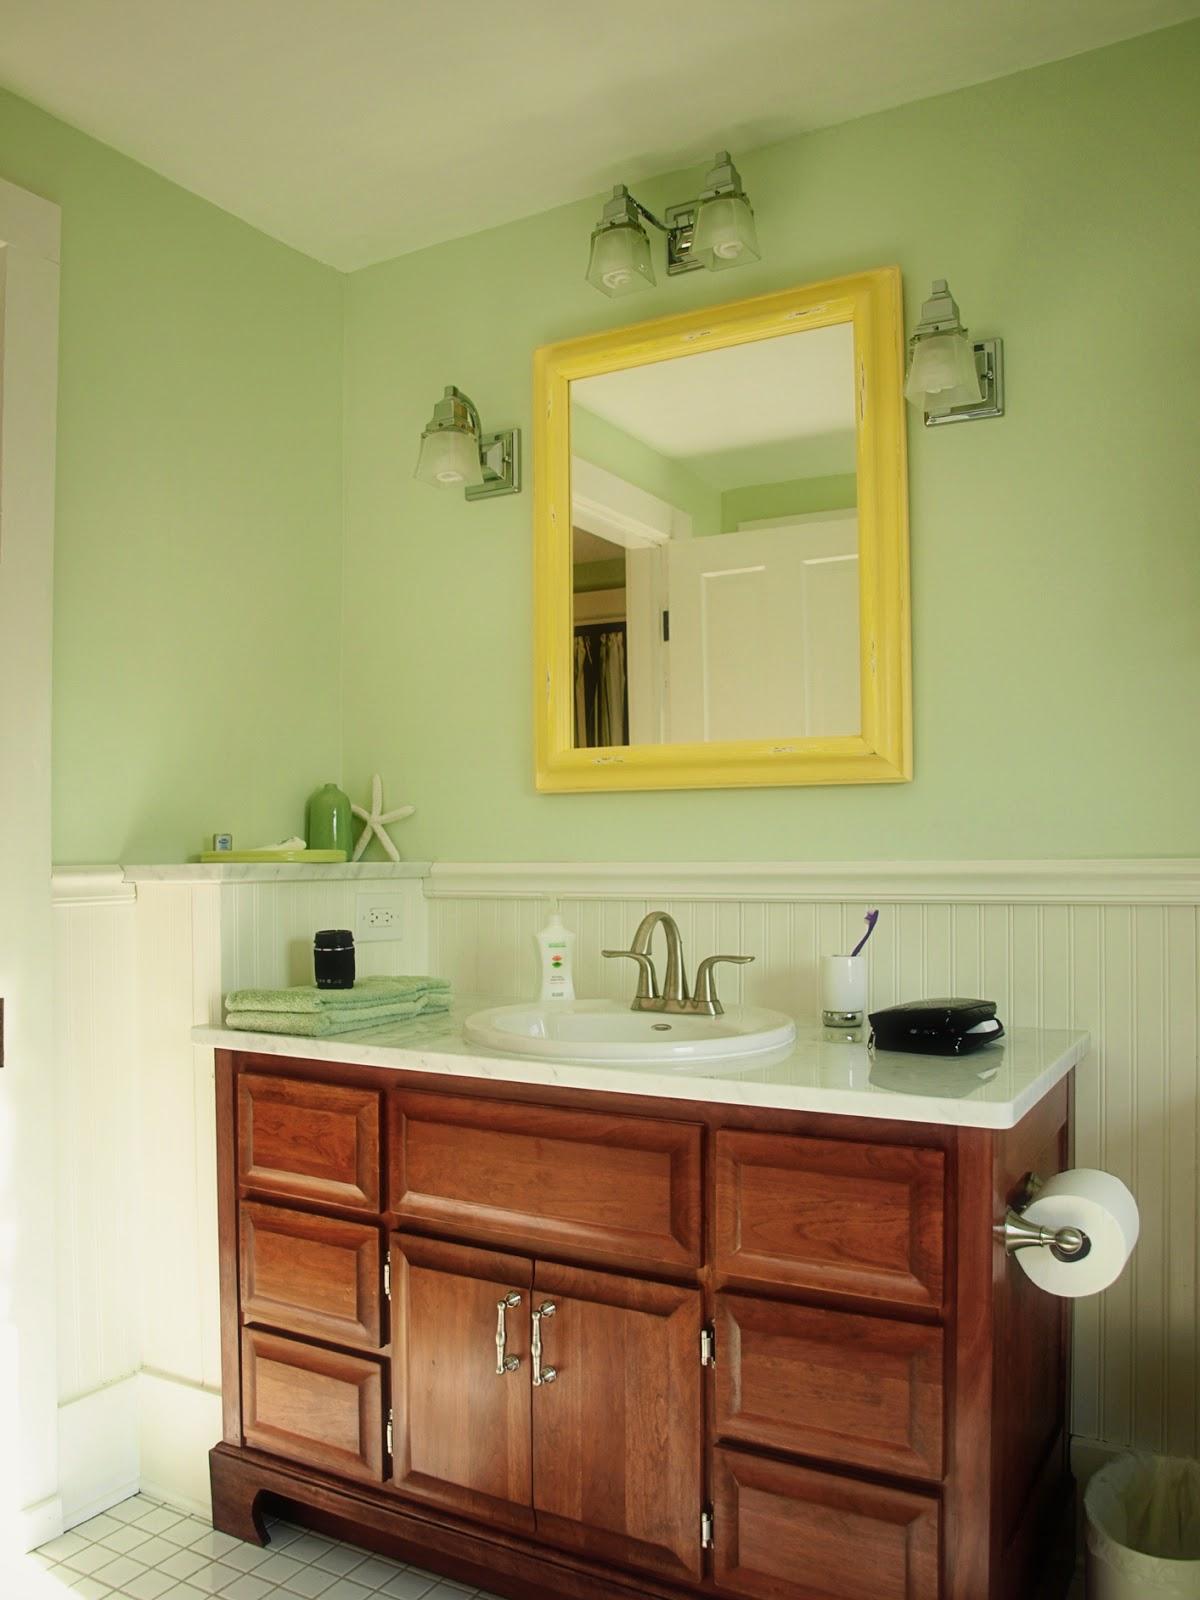 Farmhouse  bathroom  ideas  Bathroom  Designs